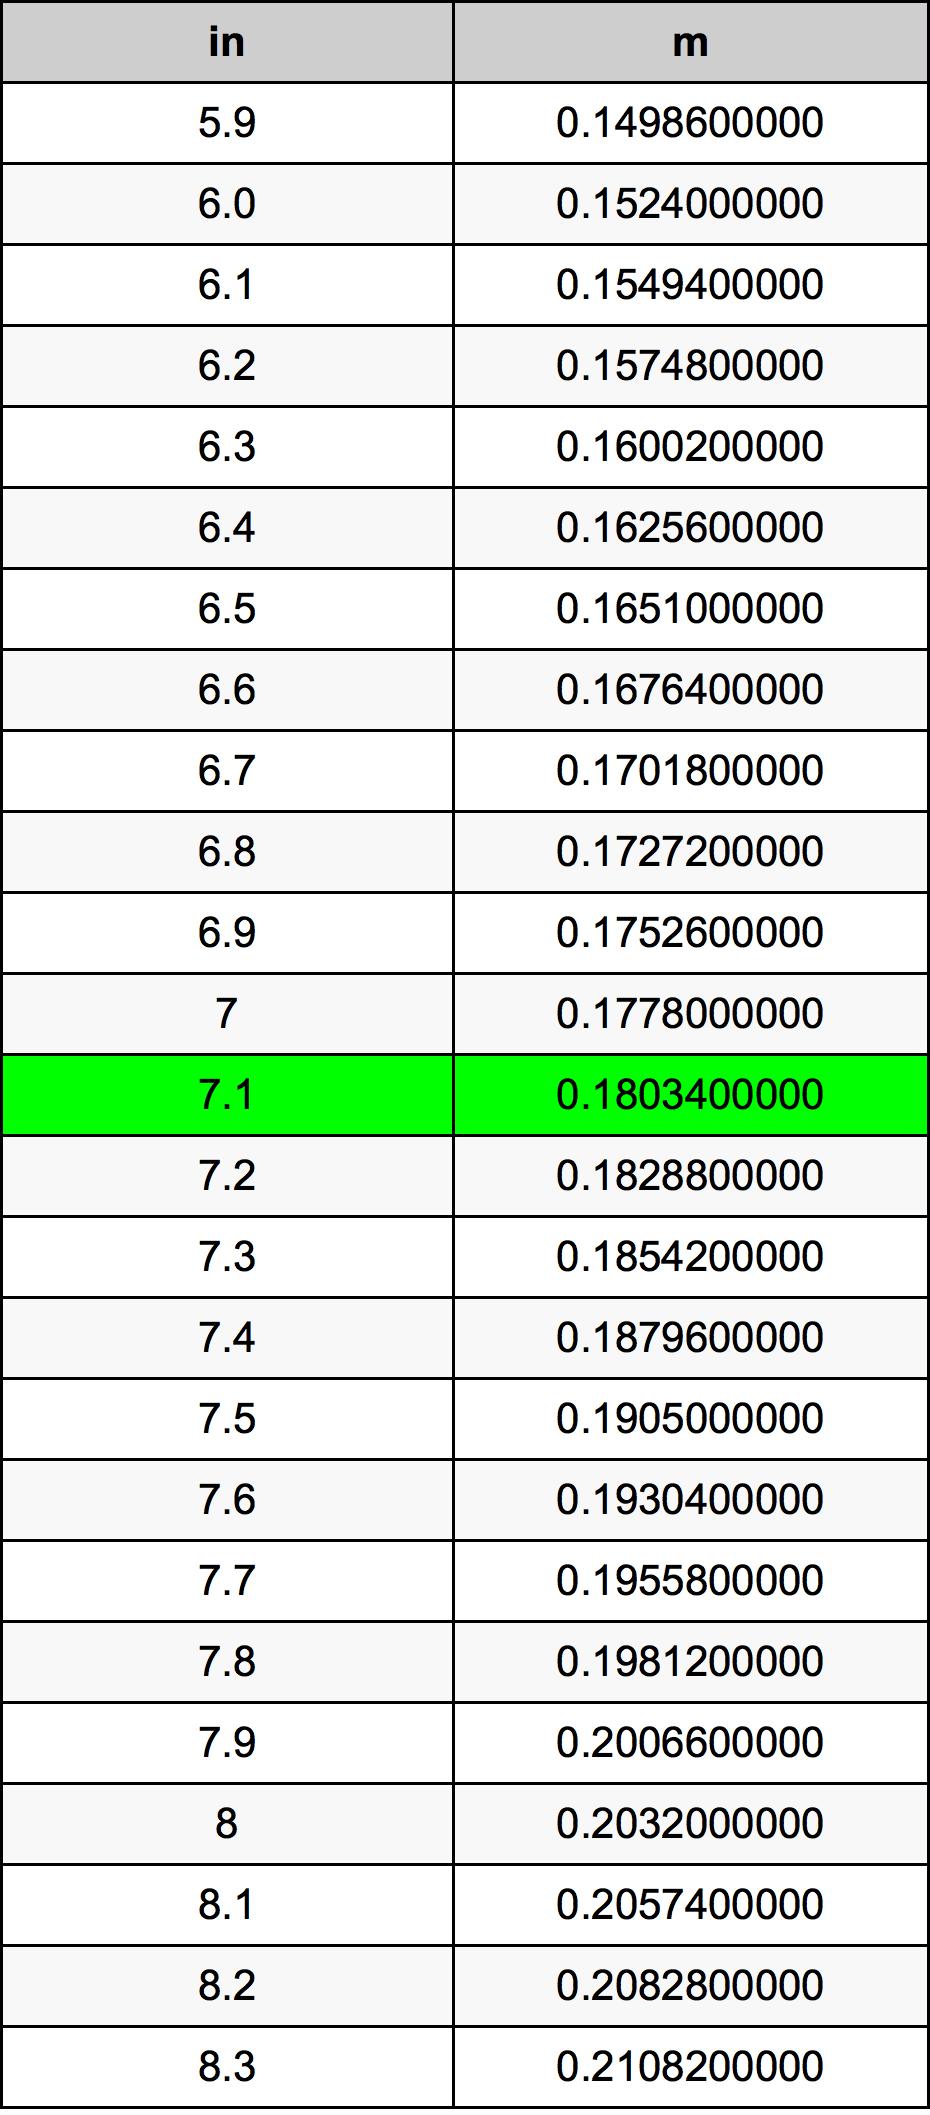 7.1 Inci konversi tabel